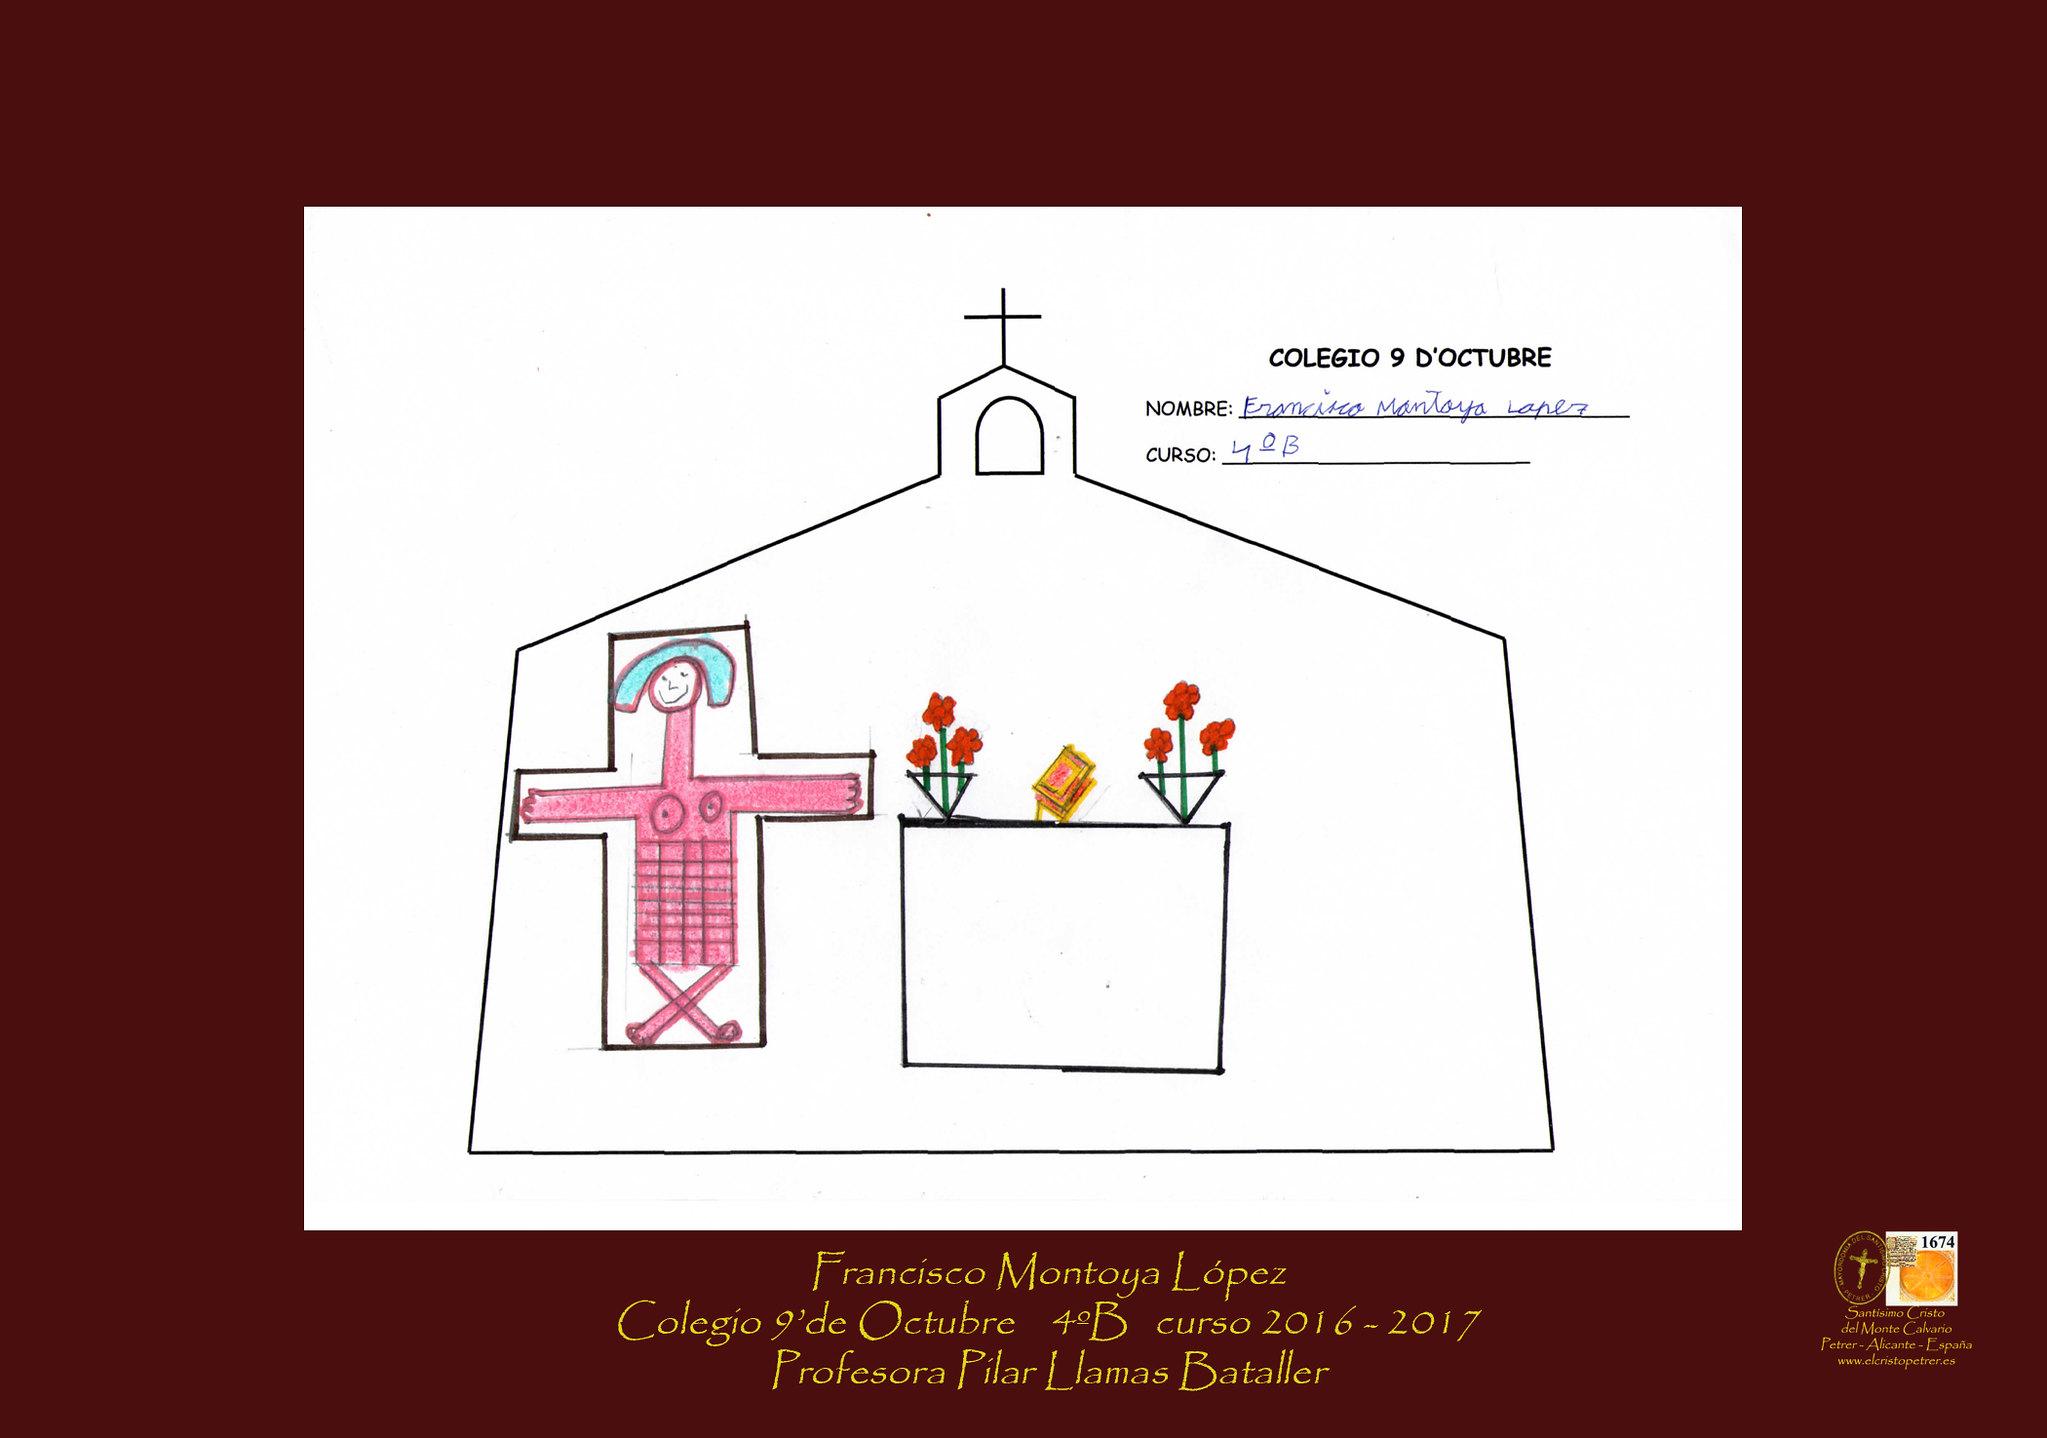 ElCristo - Actos - Exposicion Fotografica - (2017-12-01) - 9 D'Octubre - 4ºB - Montoya López, Francisco